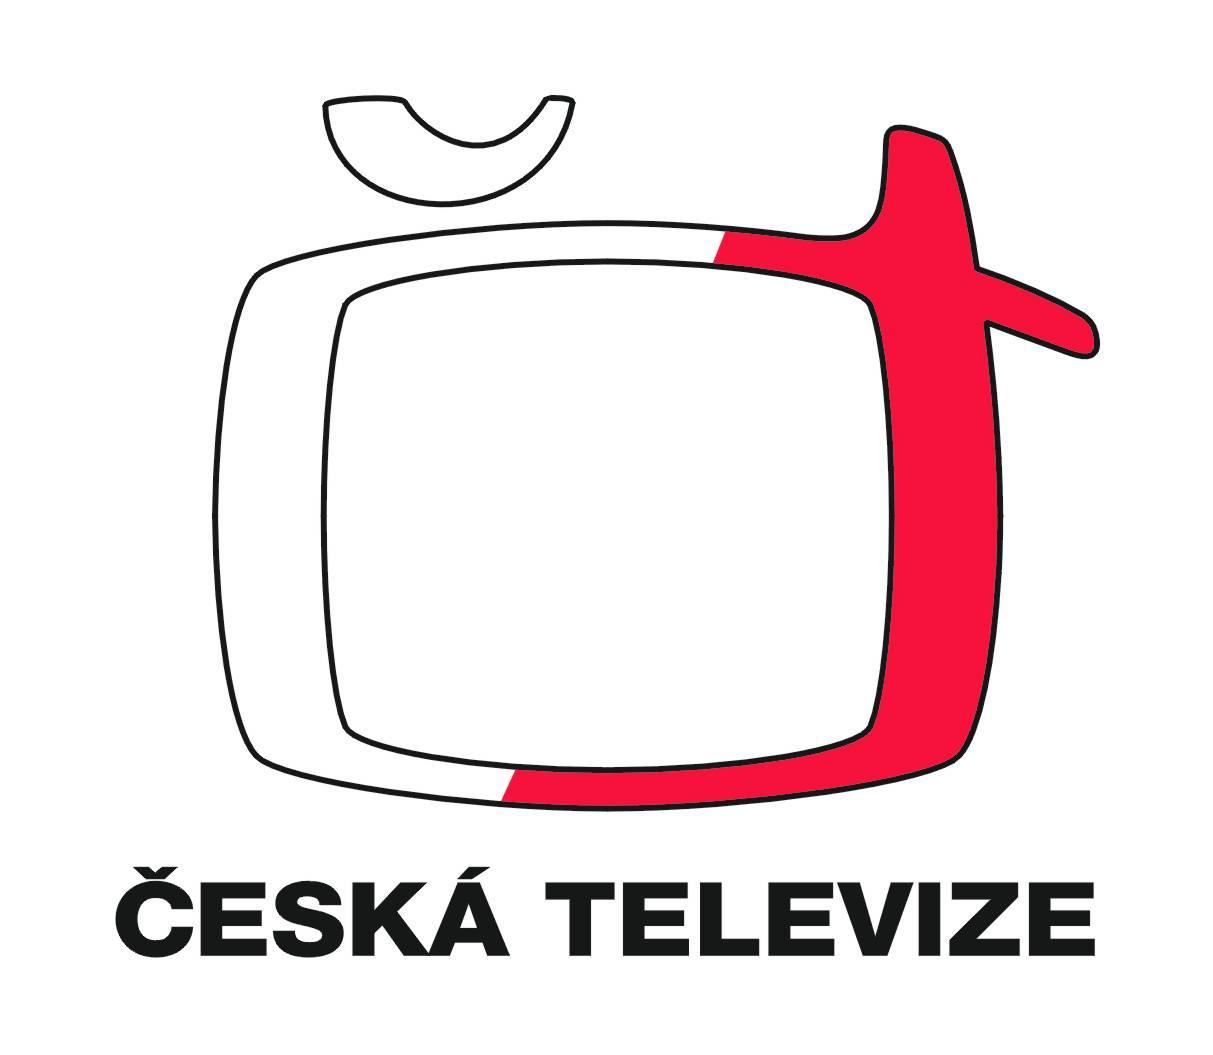 CT4 Sport Zive (Czech Republic)